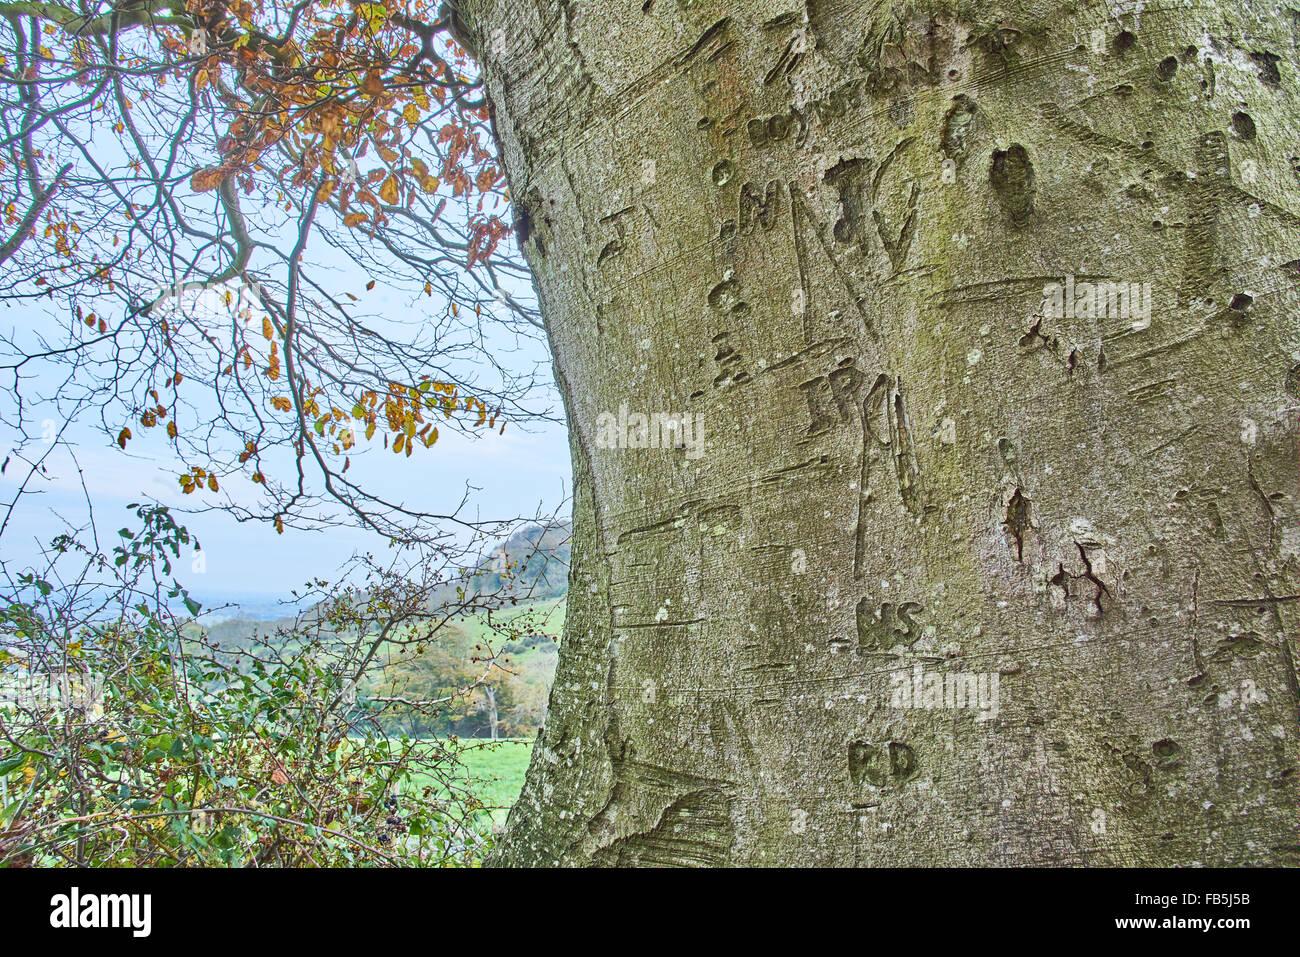 Graffiti on a tree trunk - Stock Image